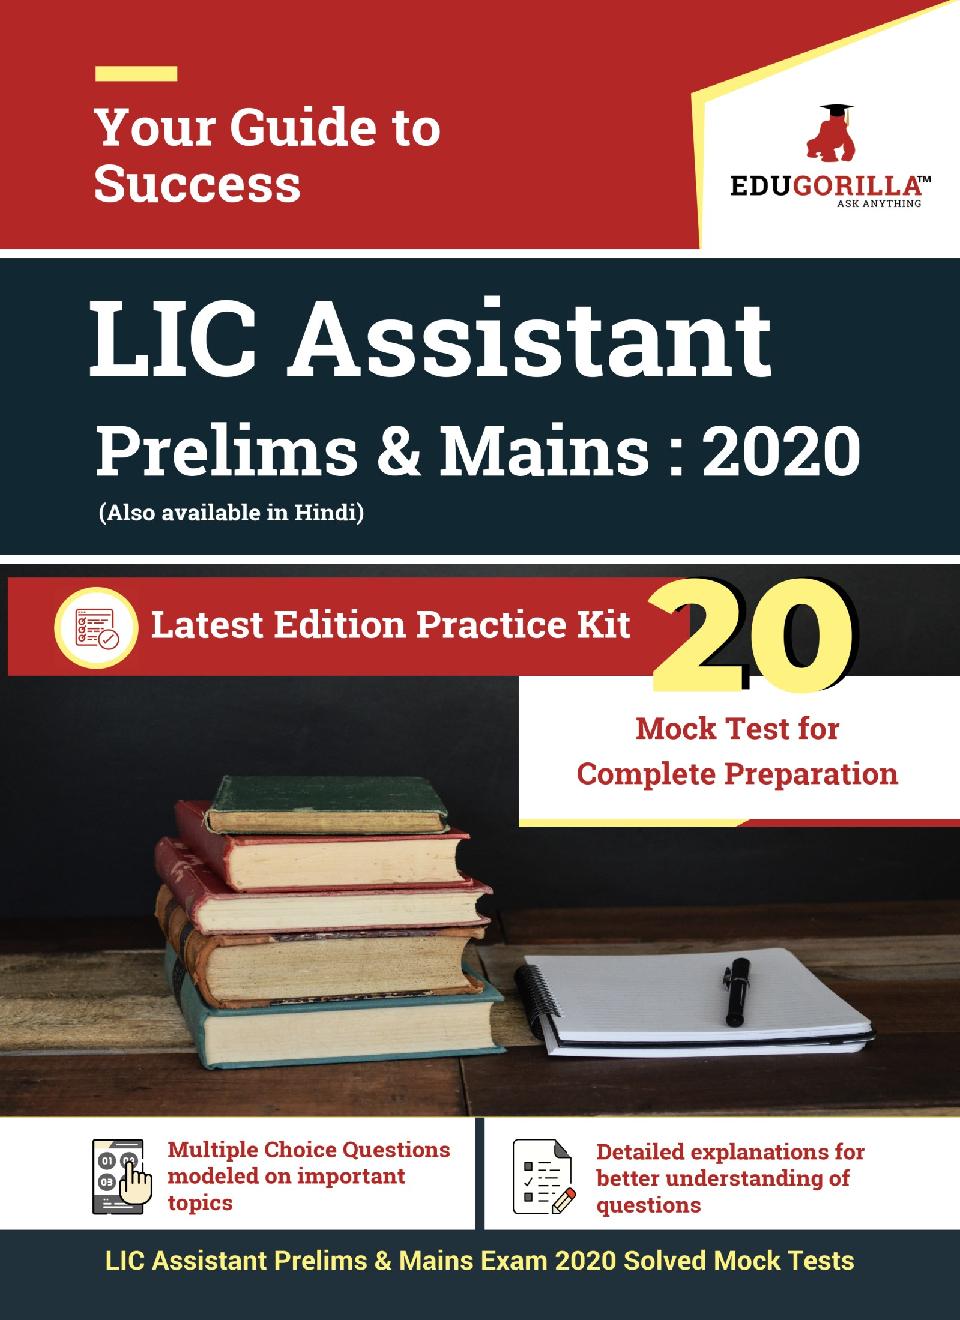 EduGorilla LIC Assistant Prelims & Mains Exam 2020 | 20 Mock Test - Page 1